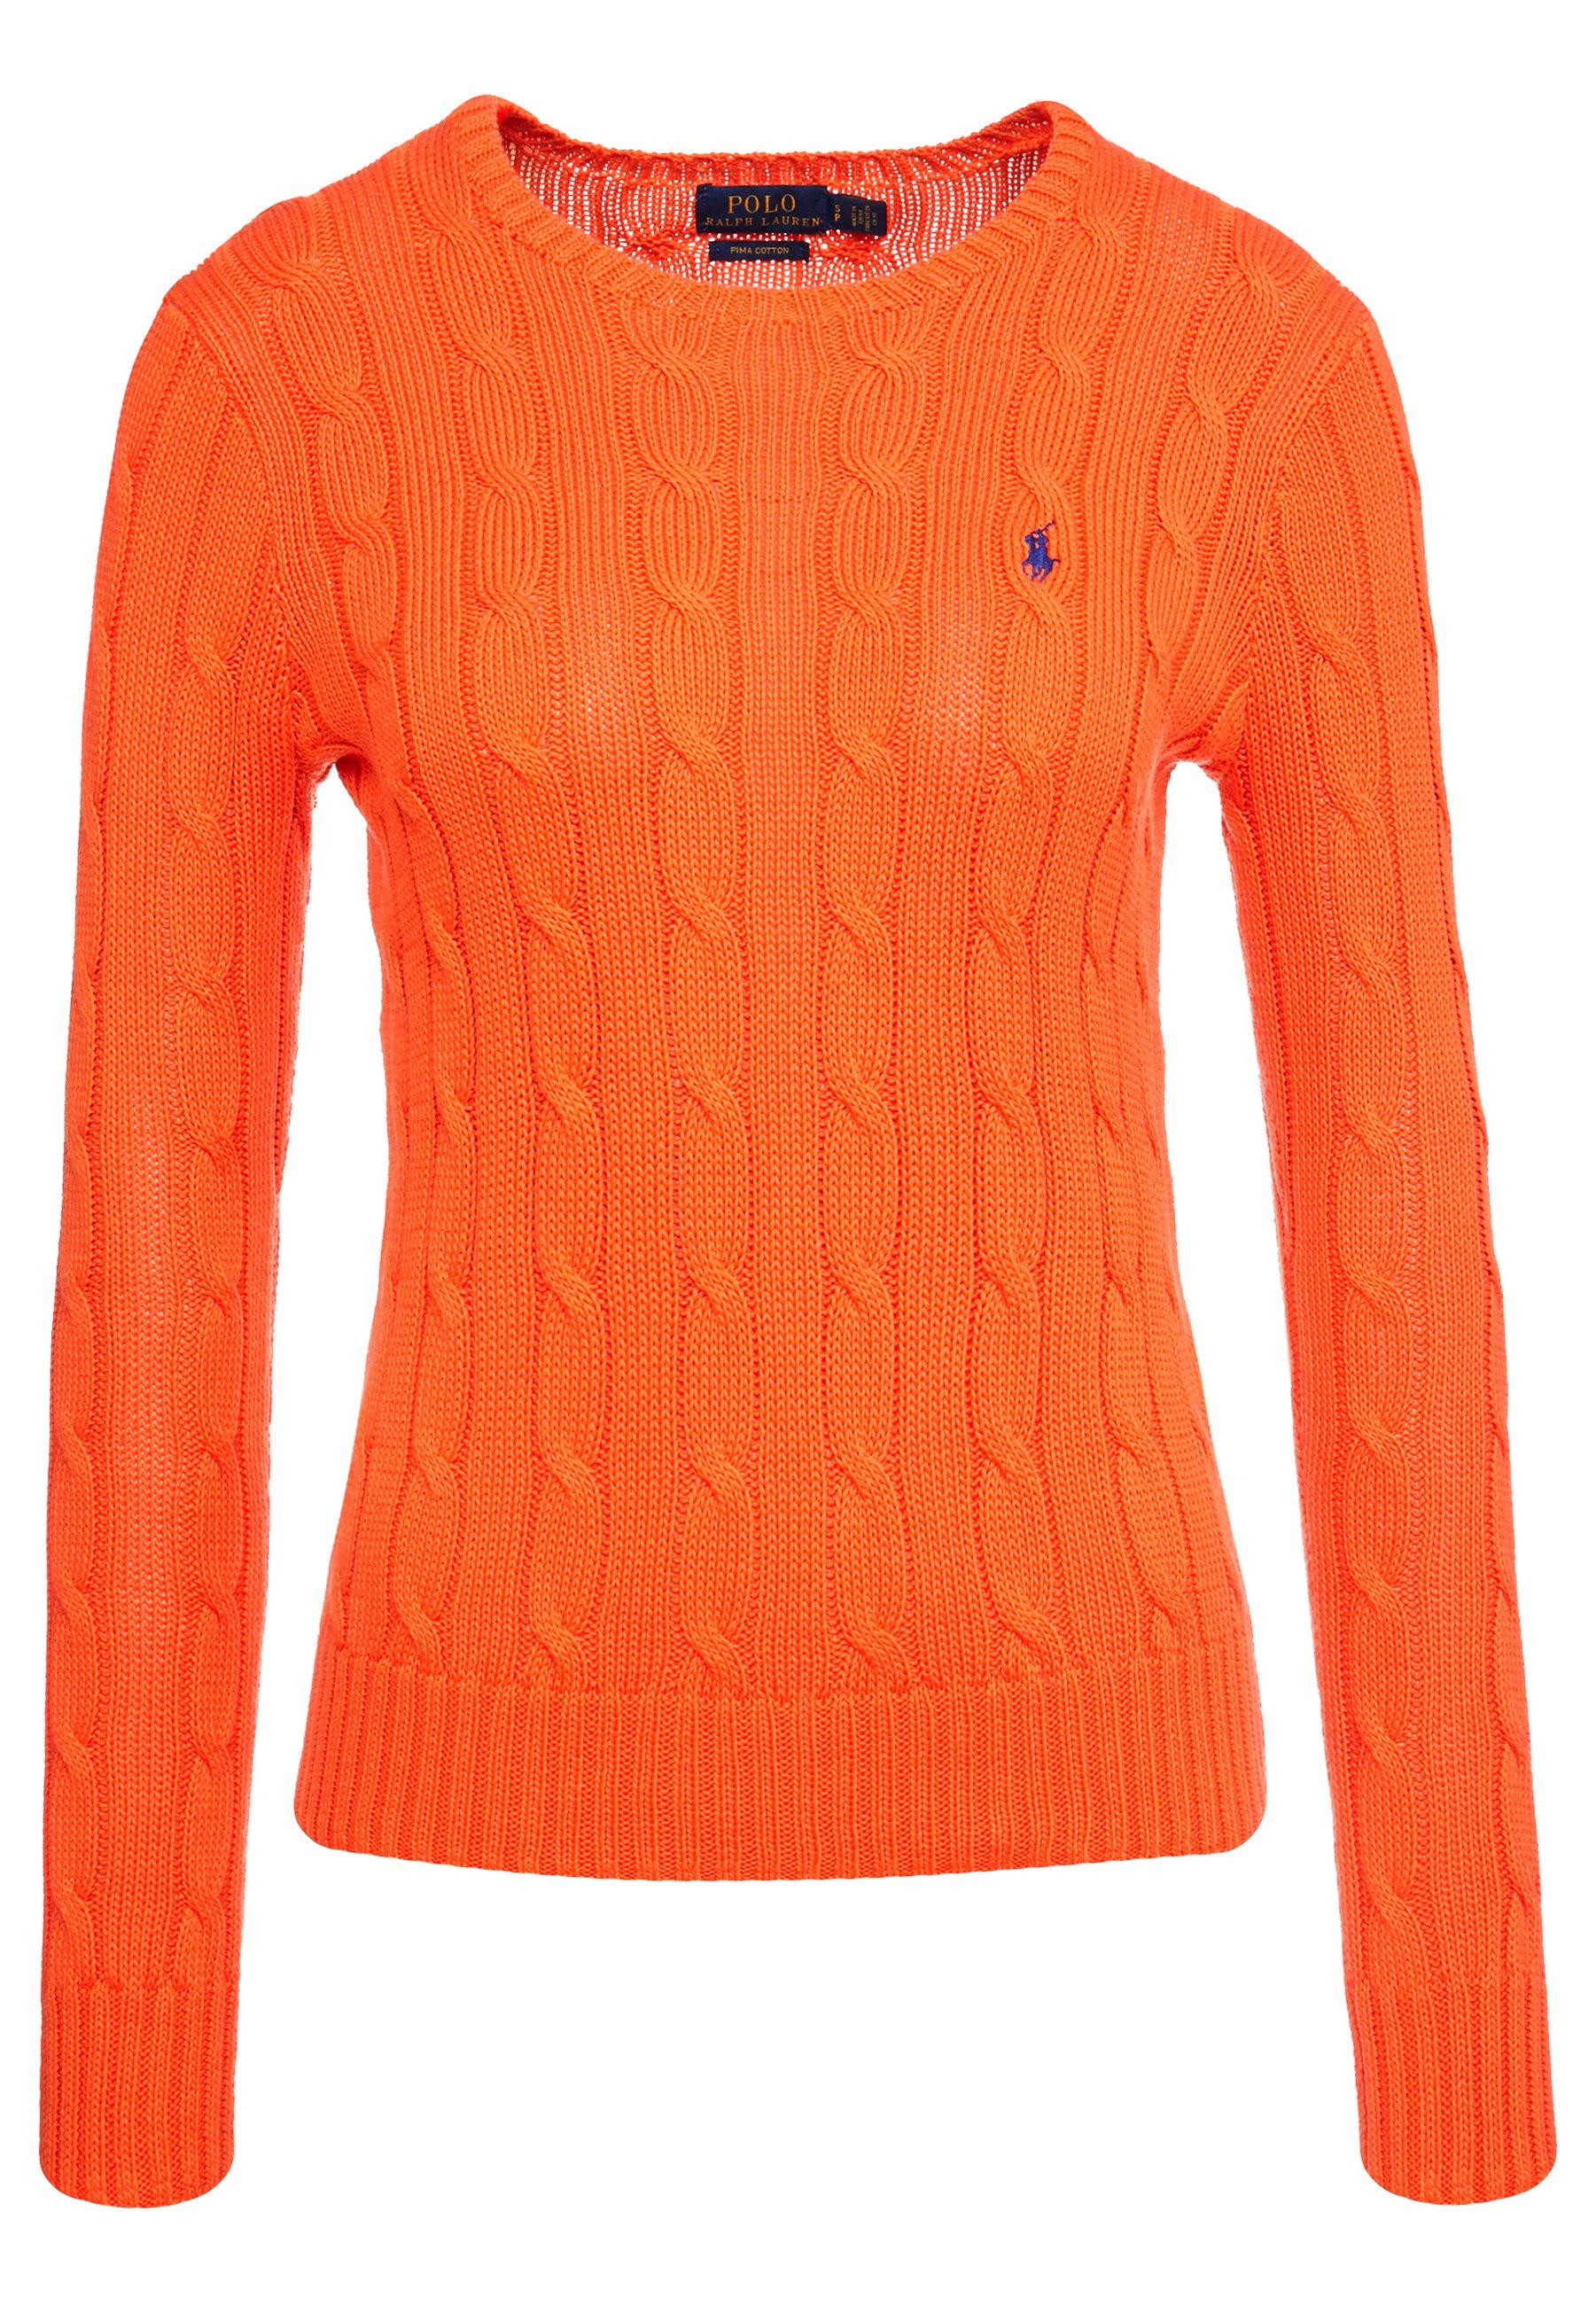 Polo Ralph Lauren Julianna Classic Long Sleeve - Jumper Tie Orange